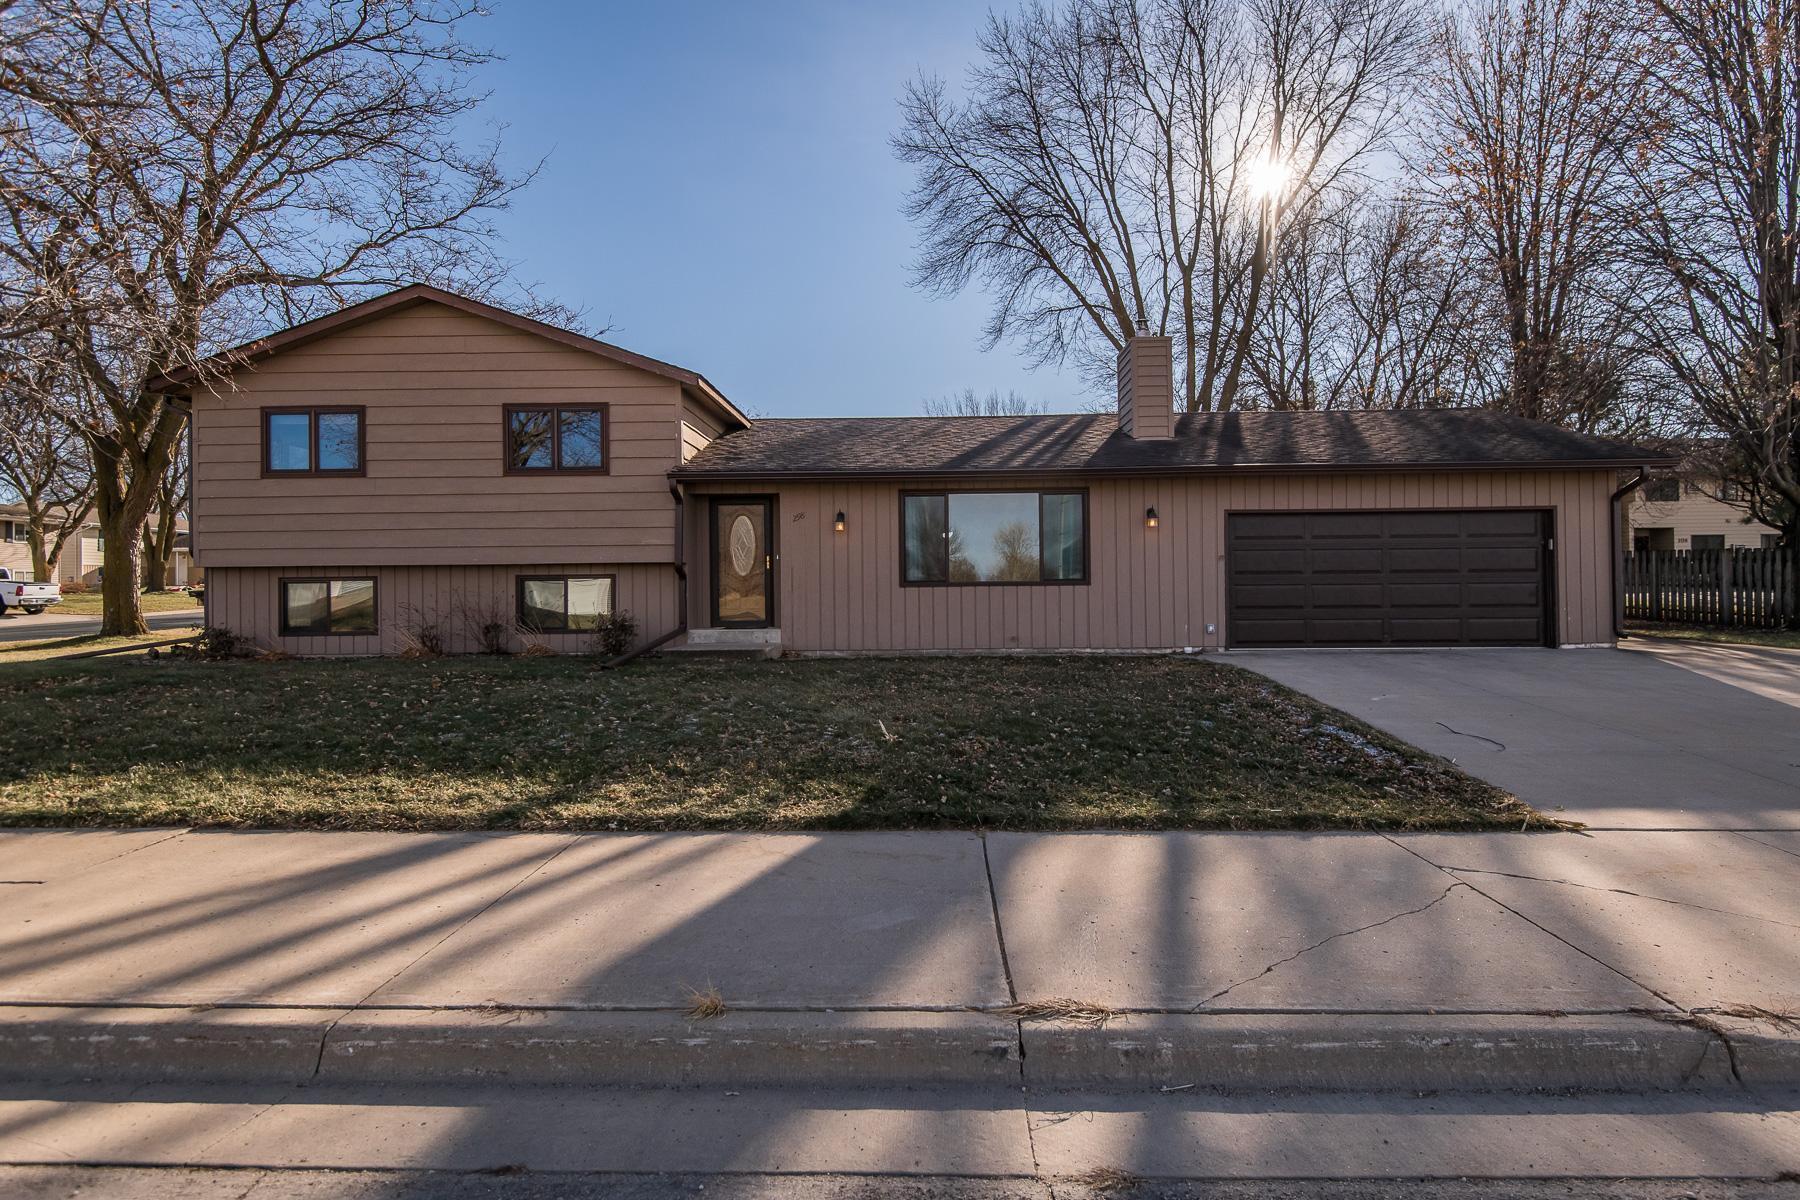 298 6th Street SE Property Photo - Stewartville, MN real estate listing